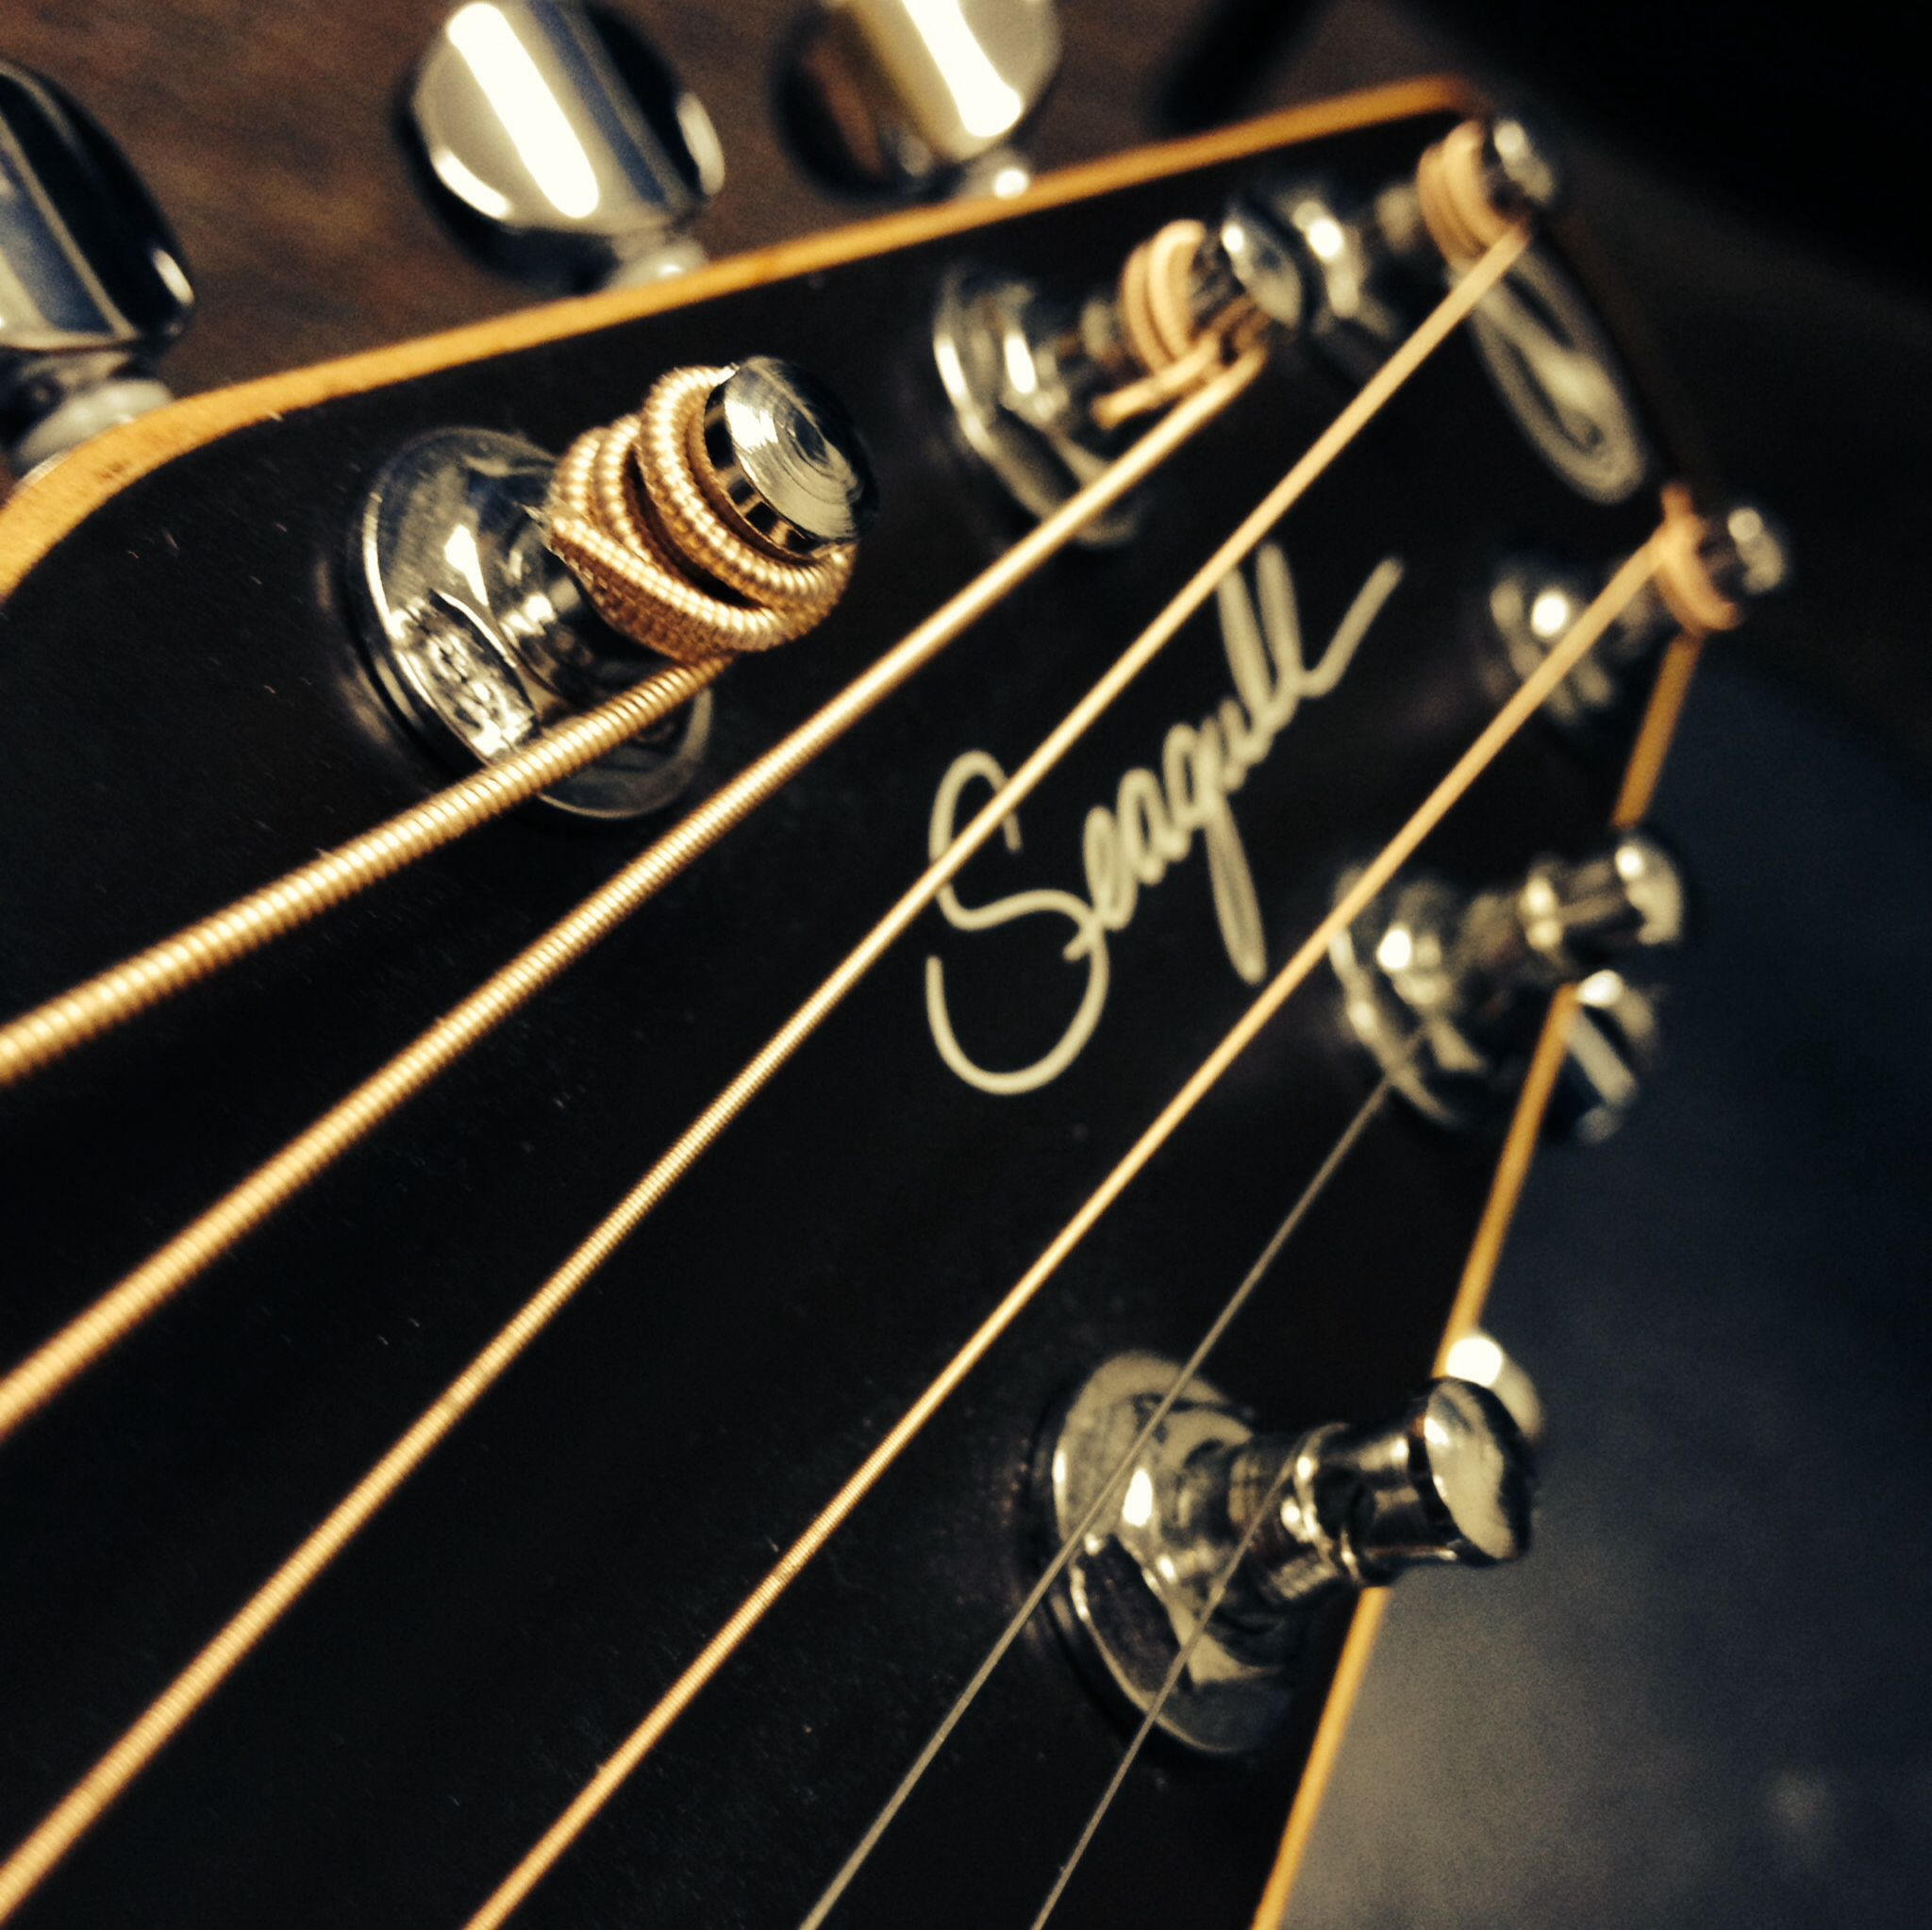 My fantastic seagull guitars gng guitarlife pinterest